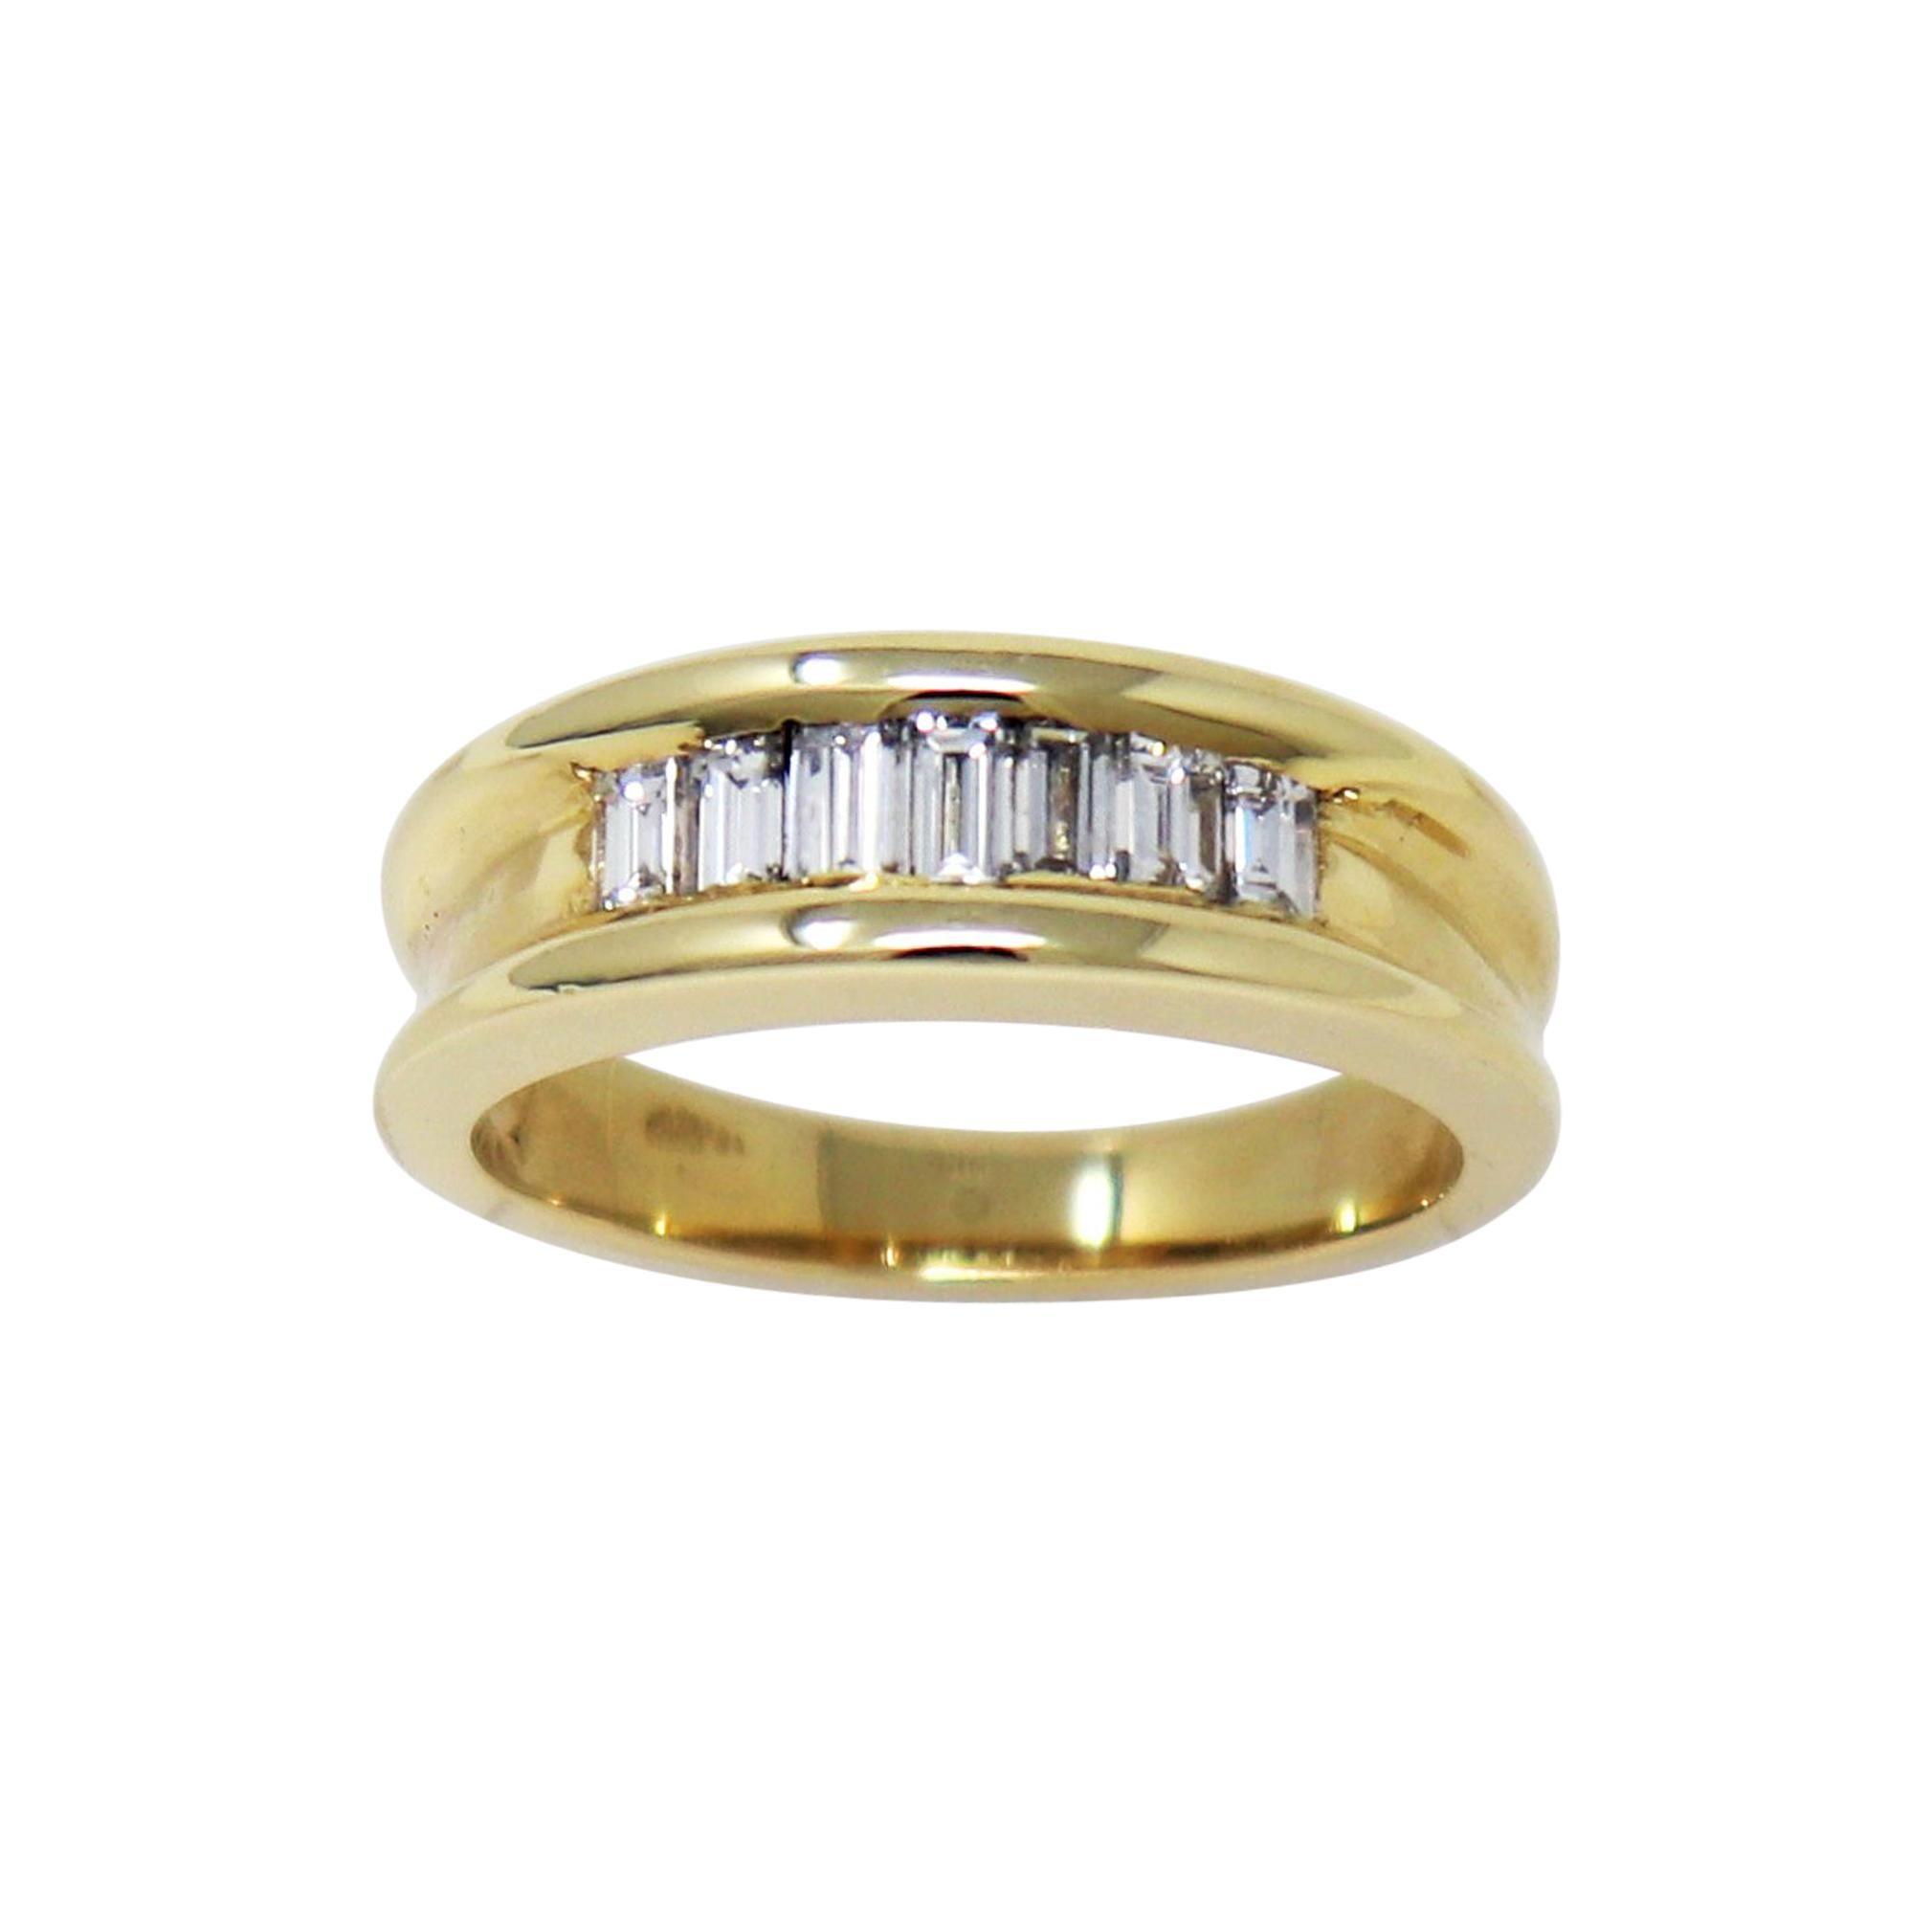 1.00 Carat Channel Set Baguette Diamond Band Ring in 14 Karat Yellow Gold Unisex